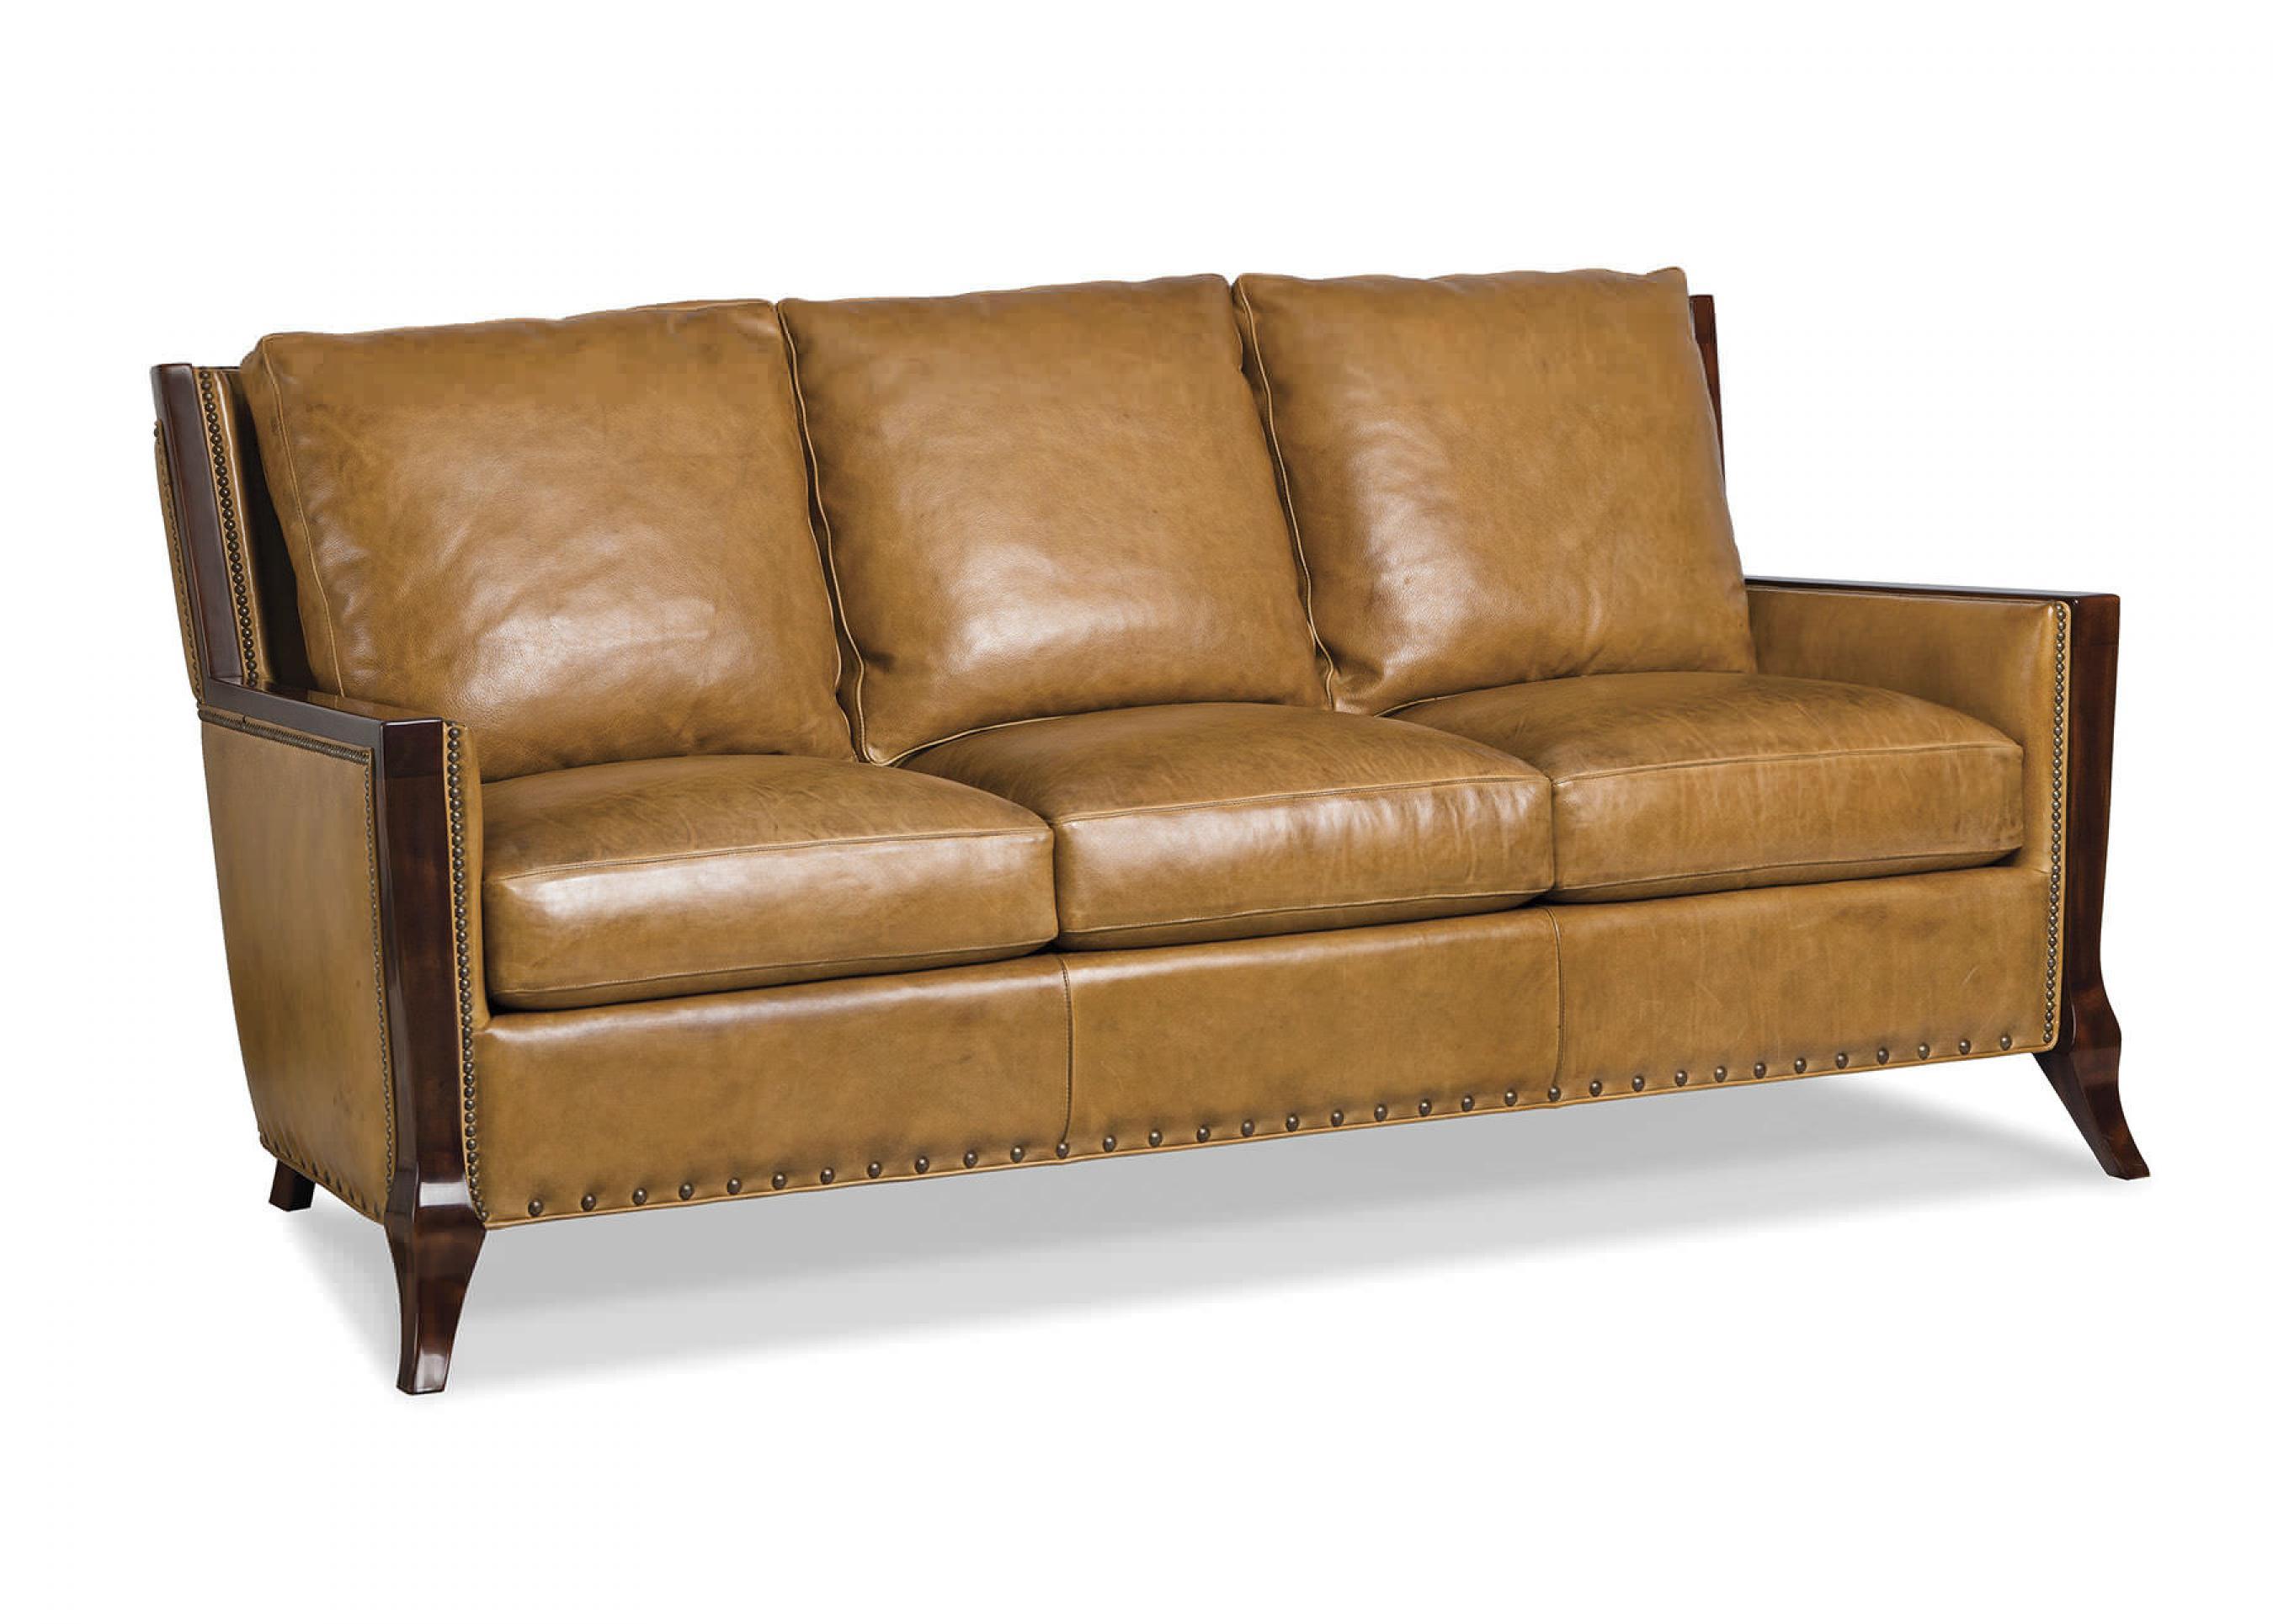 photos canap anglais trad. Black Bedroom Furniture Sets. Home Design Ideas